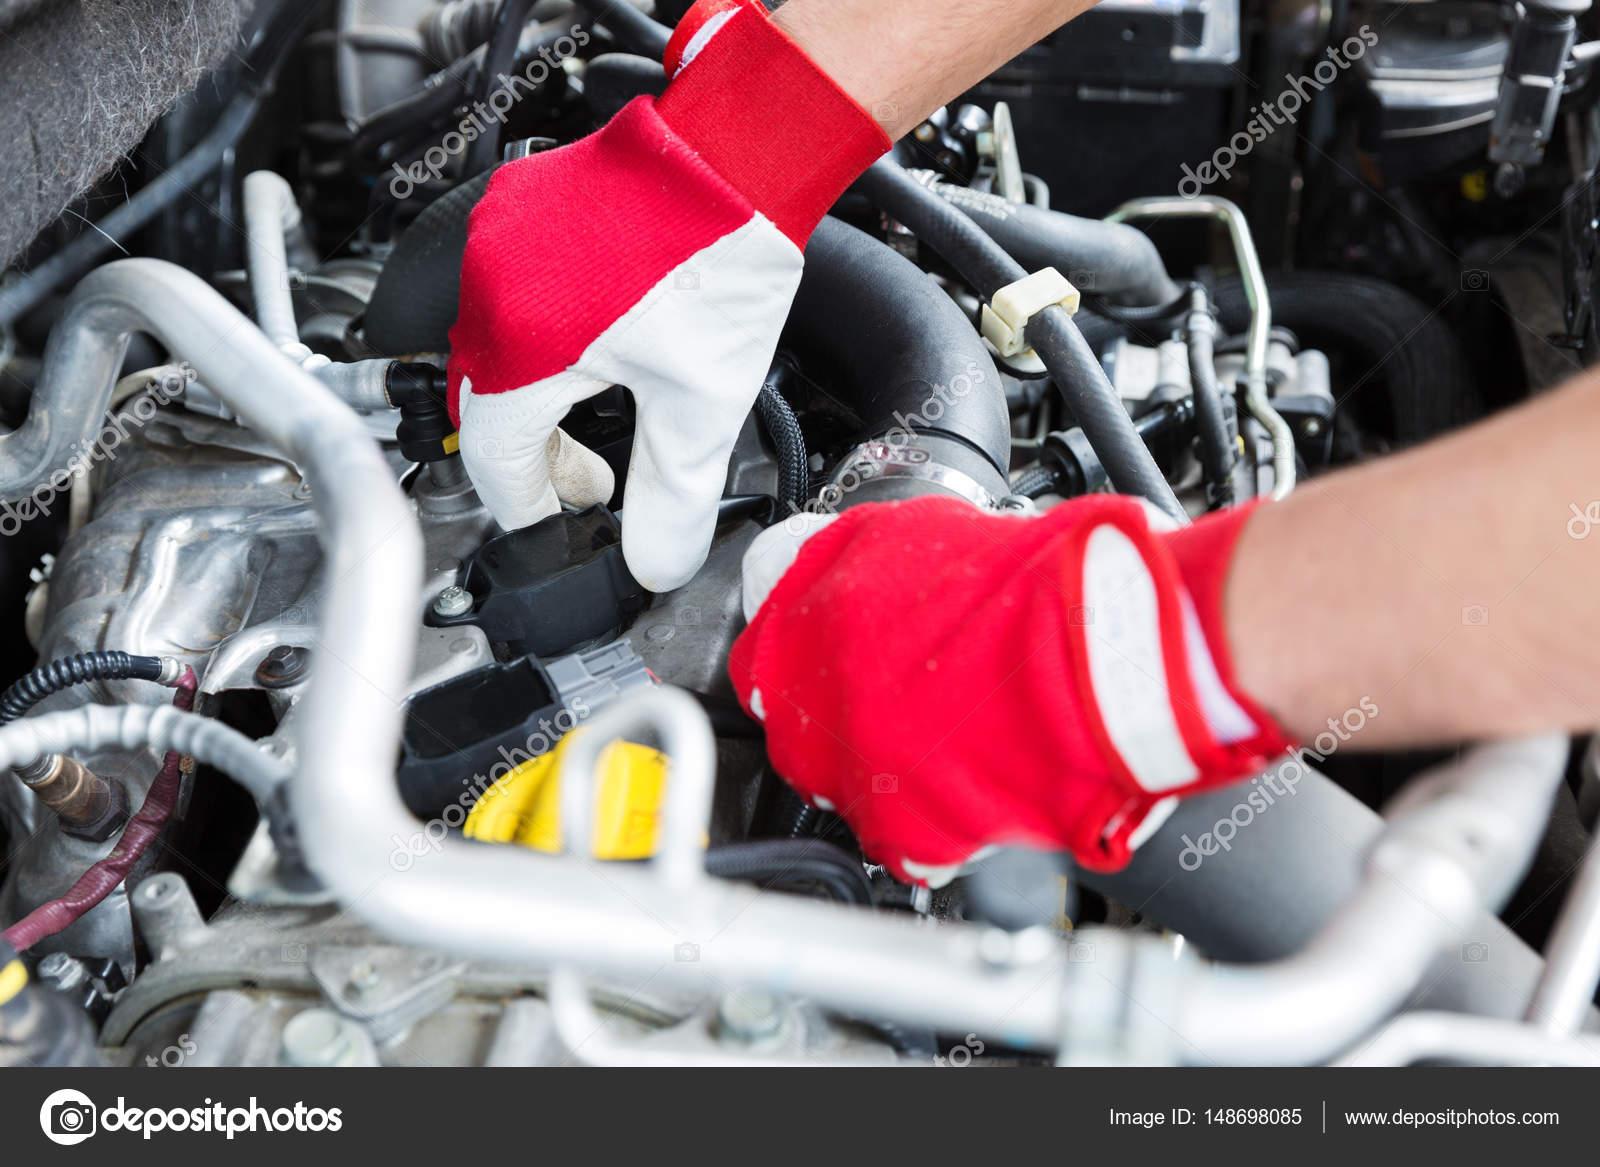 Kfz-Mechaniker, Auto-Motor-Zündkabel überprüfen — Stockfoto ...